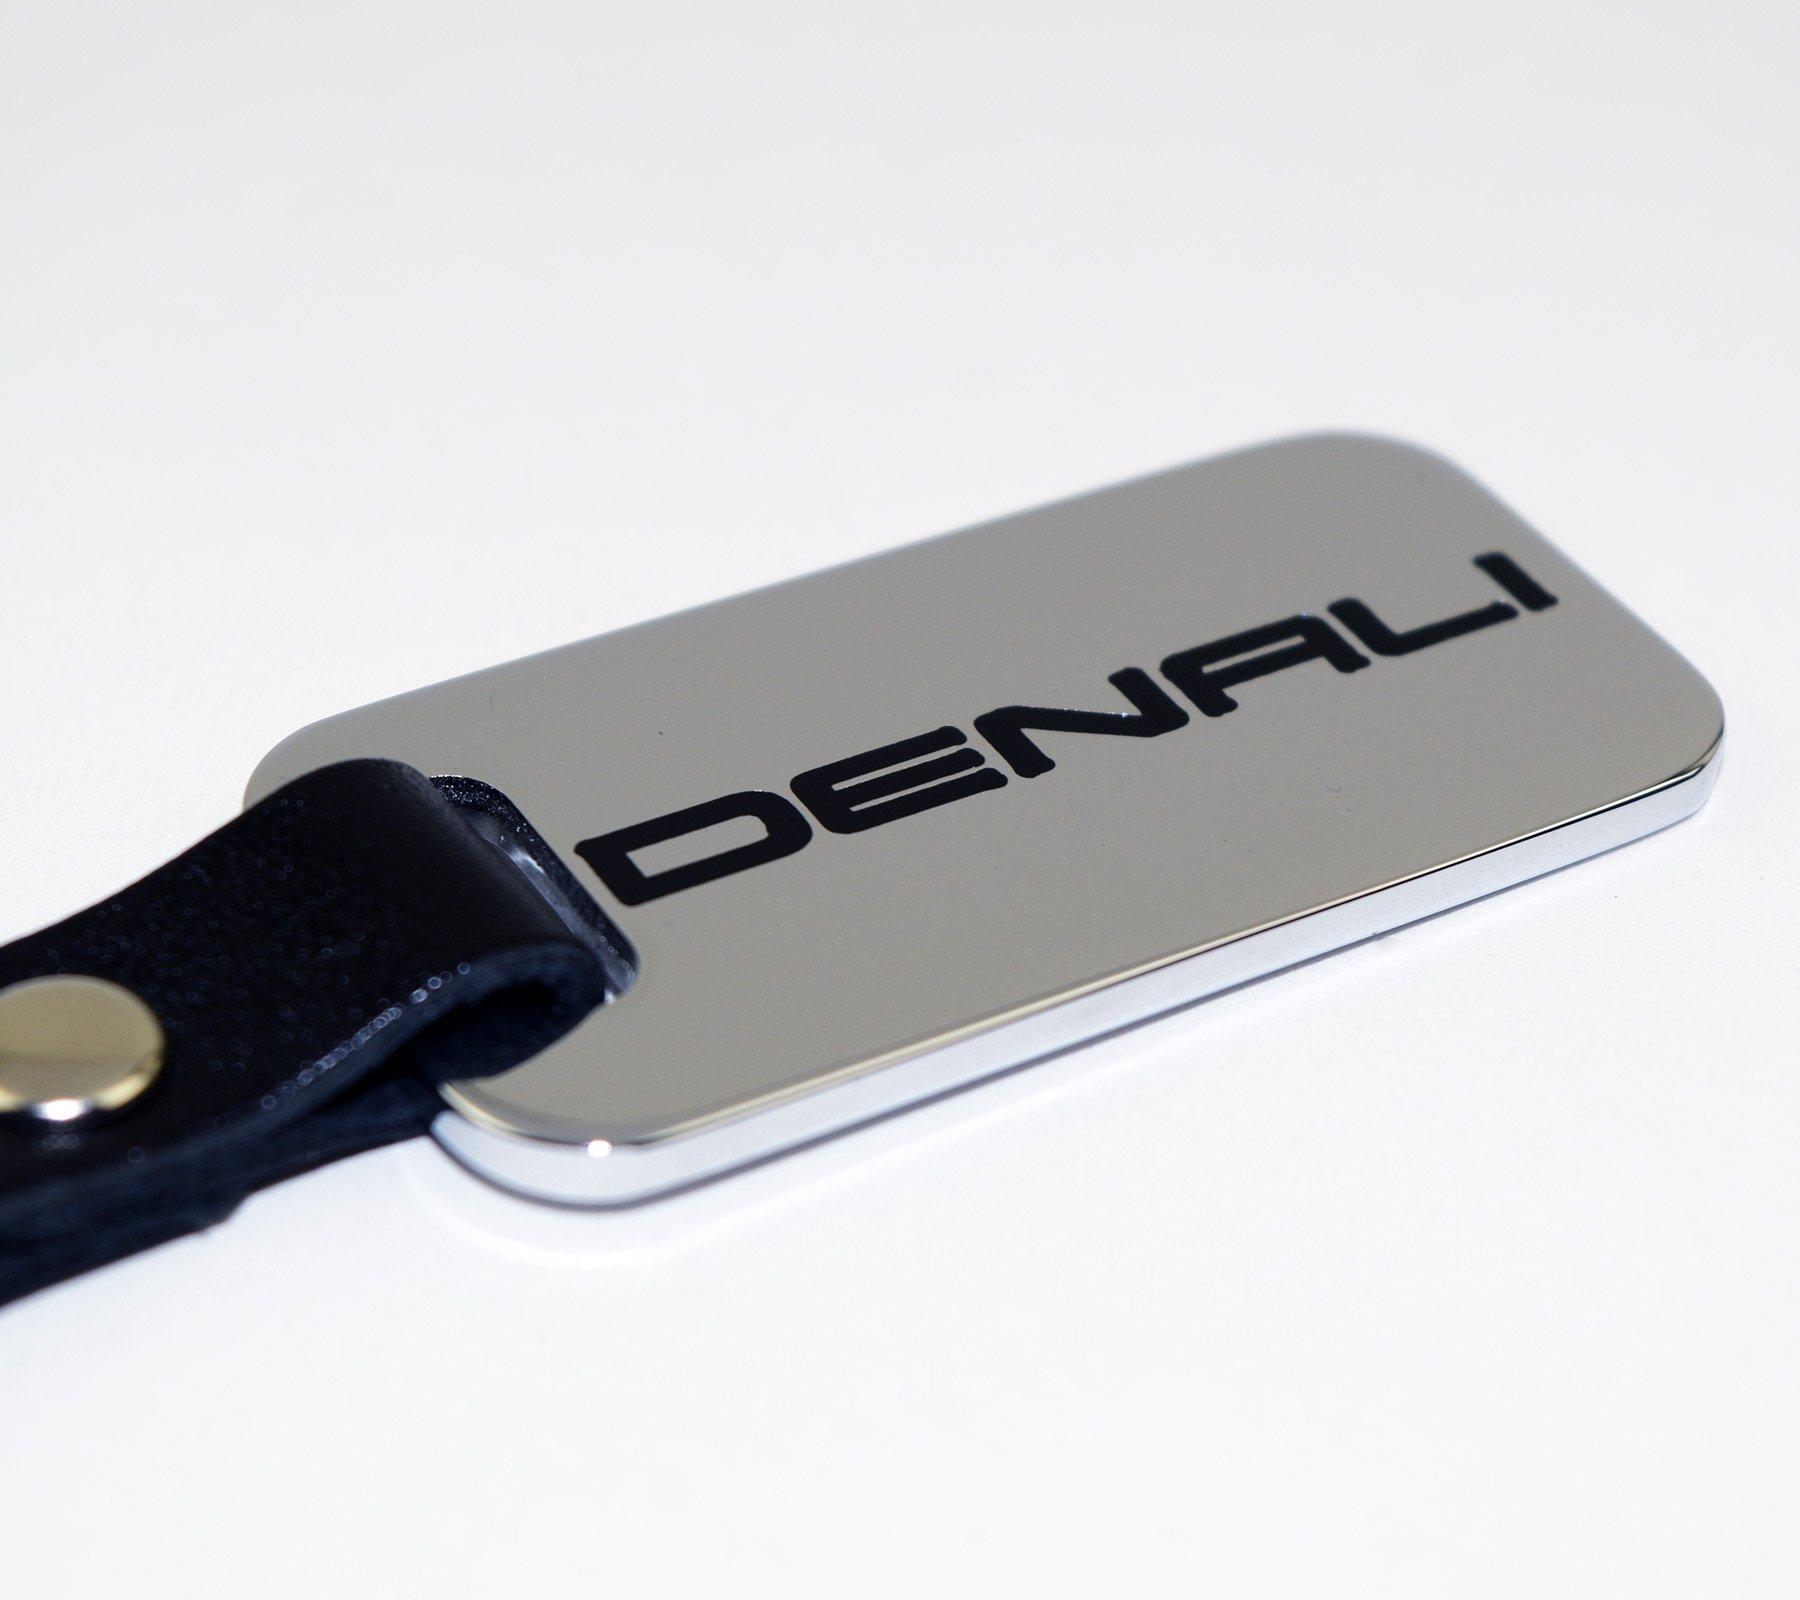 Denali Chrome Key Chain Fob - Engraved Denali Black Logo - Yukon Acadia Terrain Sierra